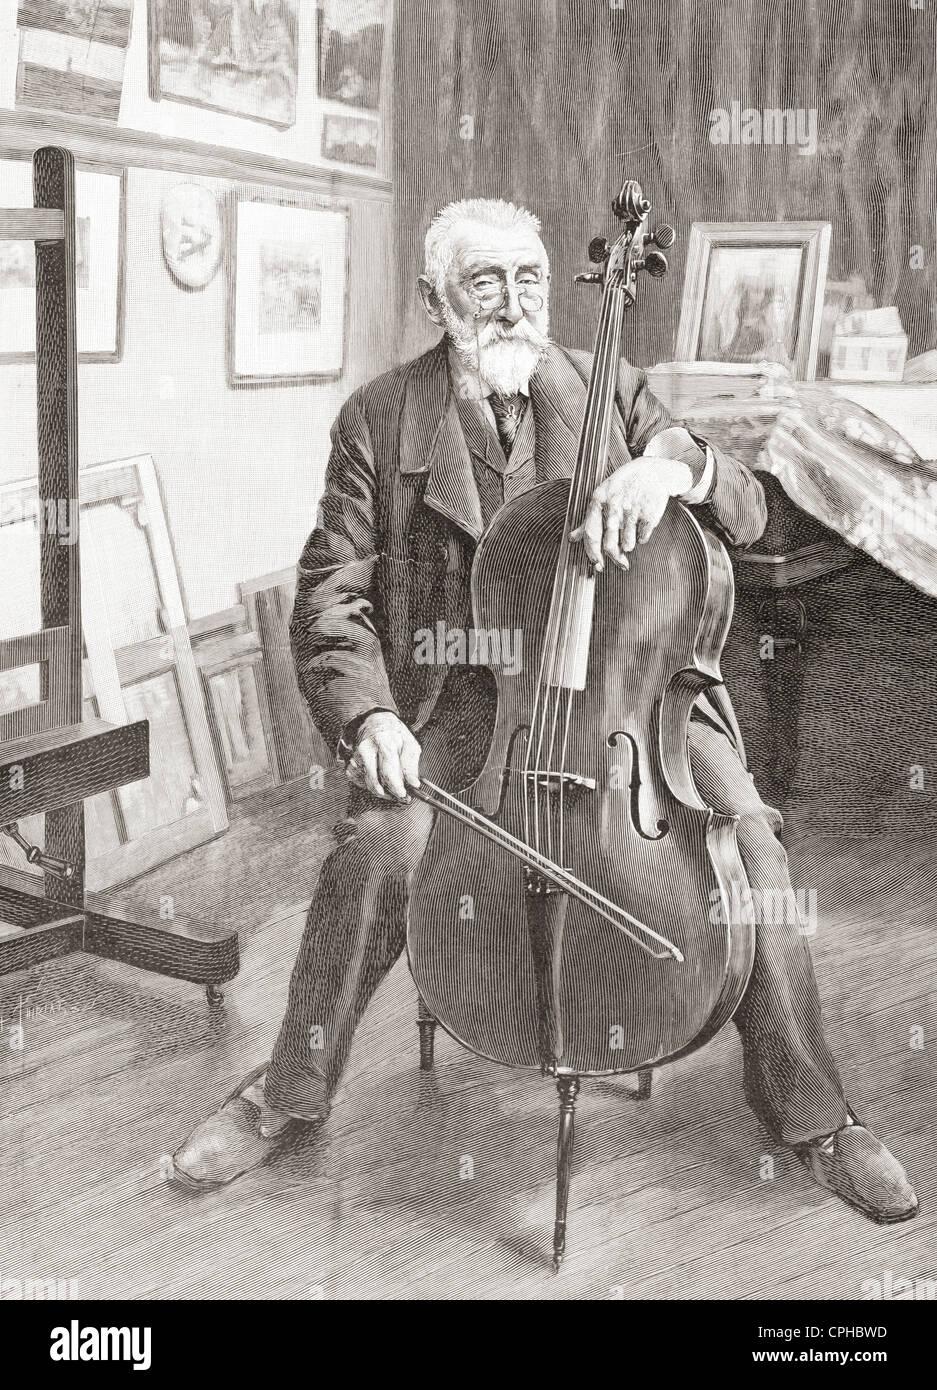 Henri-Joseph Harpignies, 1819 – 1916. French landscape painter. From L'Illustration published 1897. - Stock Image